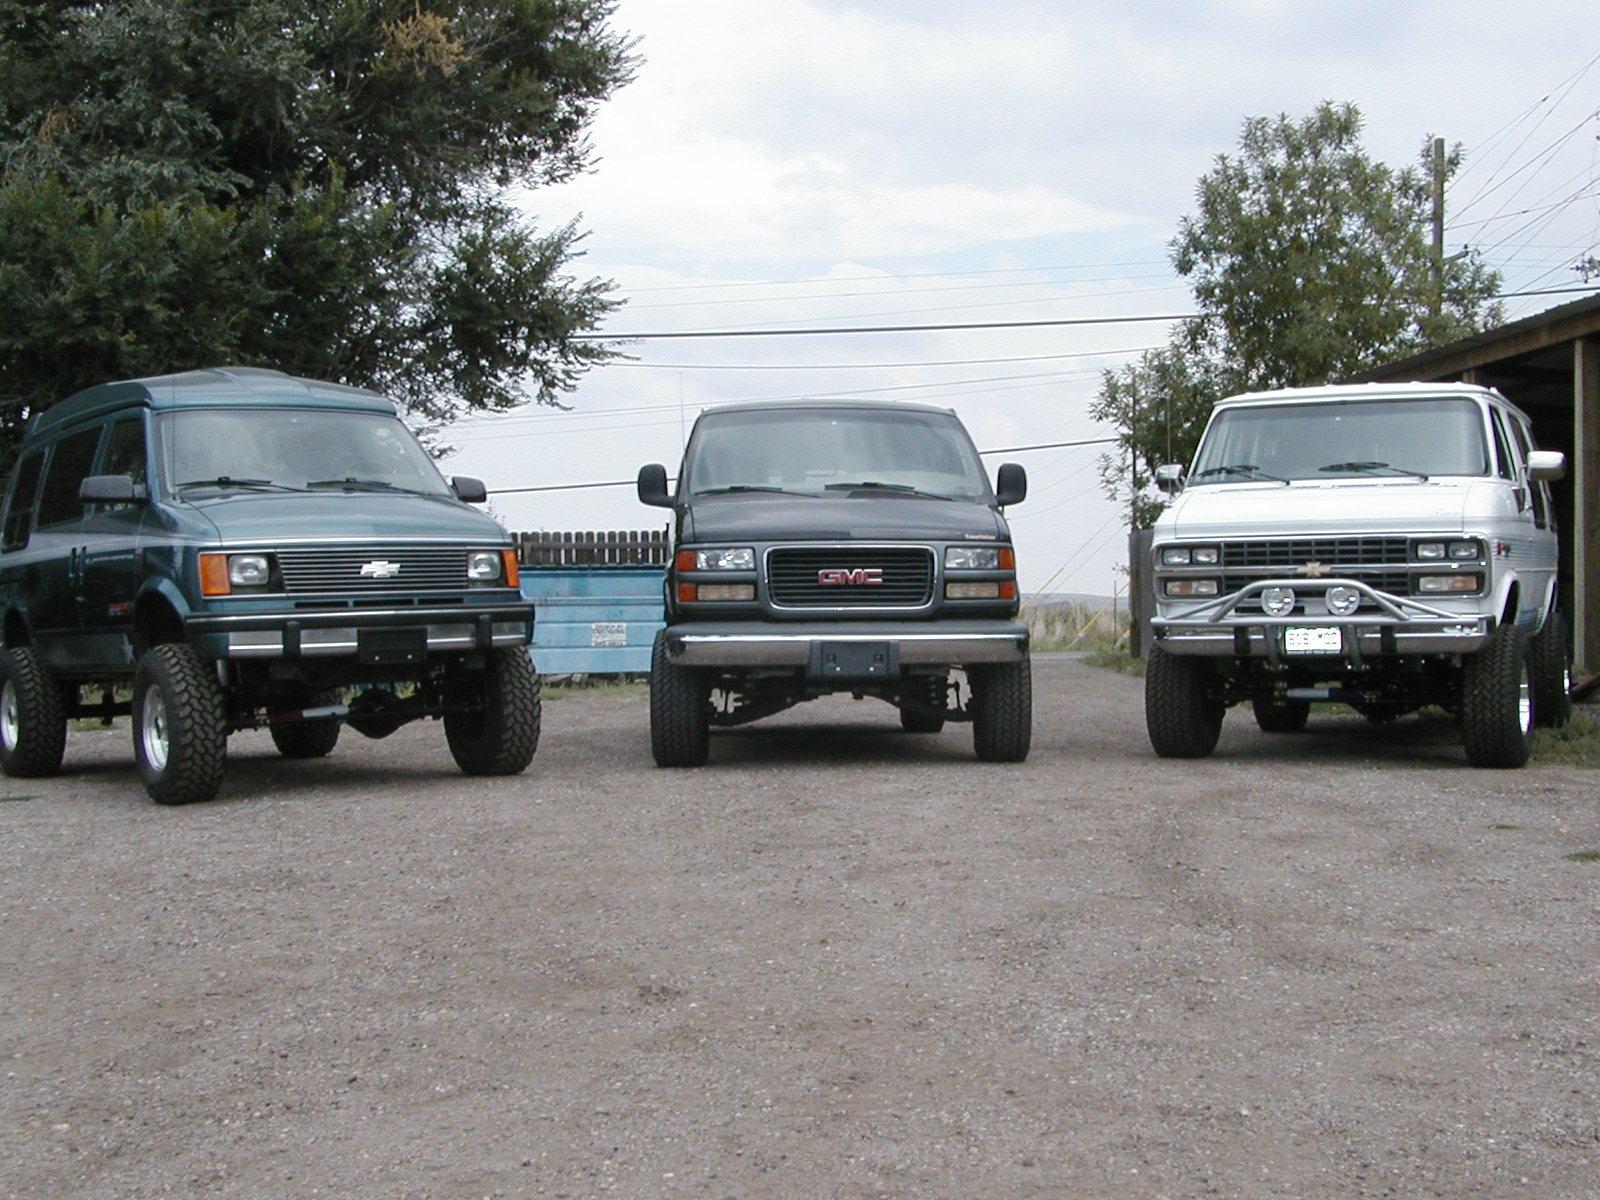 4x4 Chey and Gmc vans